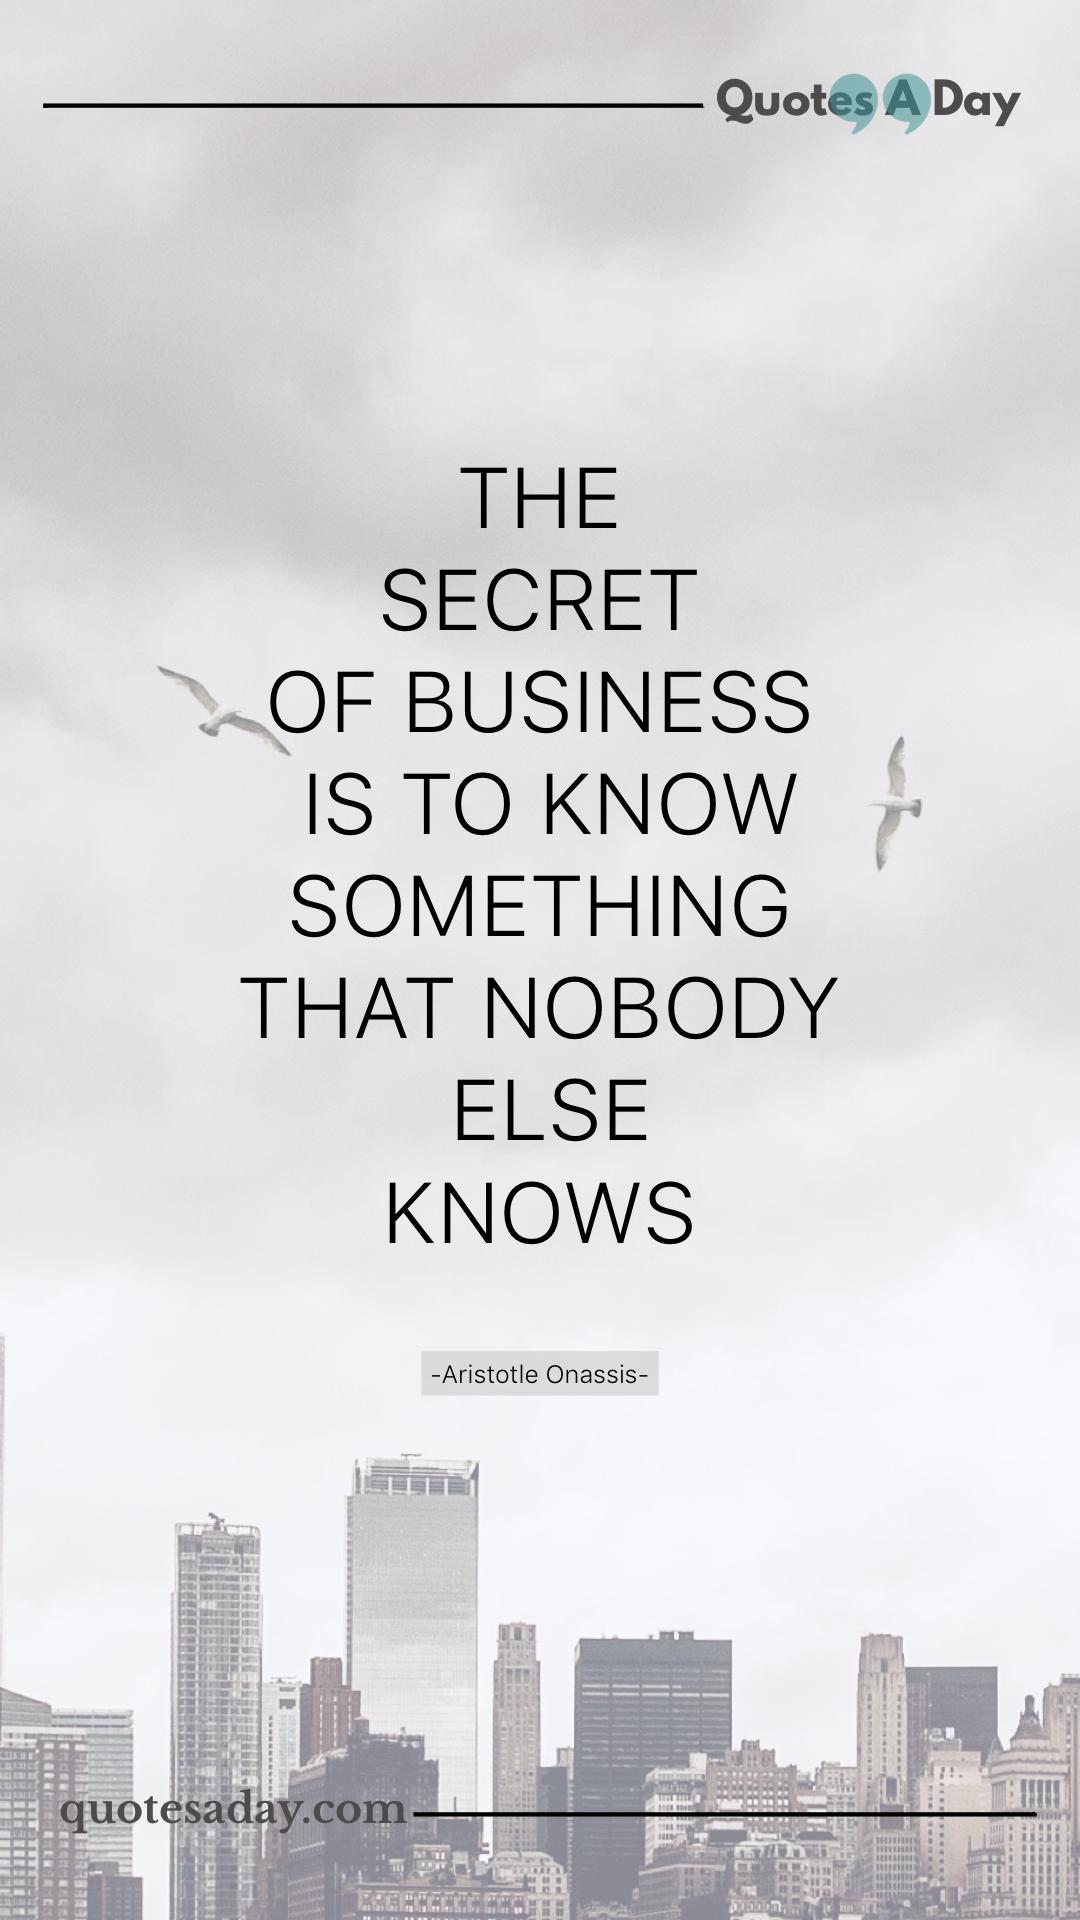 Aristotle Onassis Quote Aristotle onassis, Business